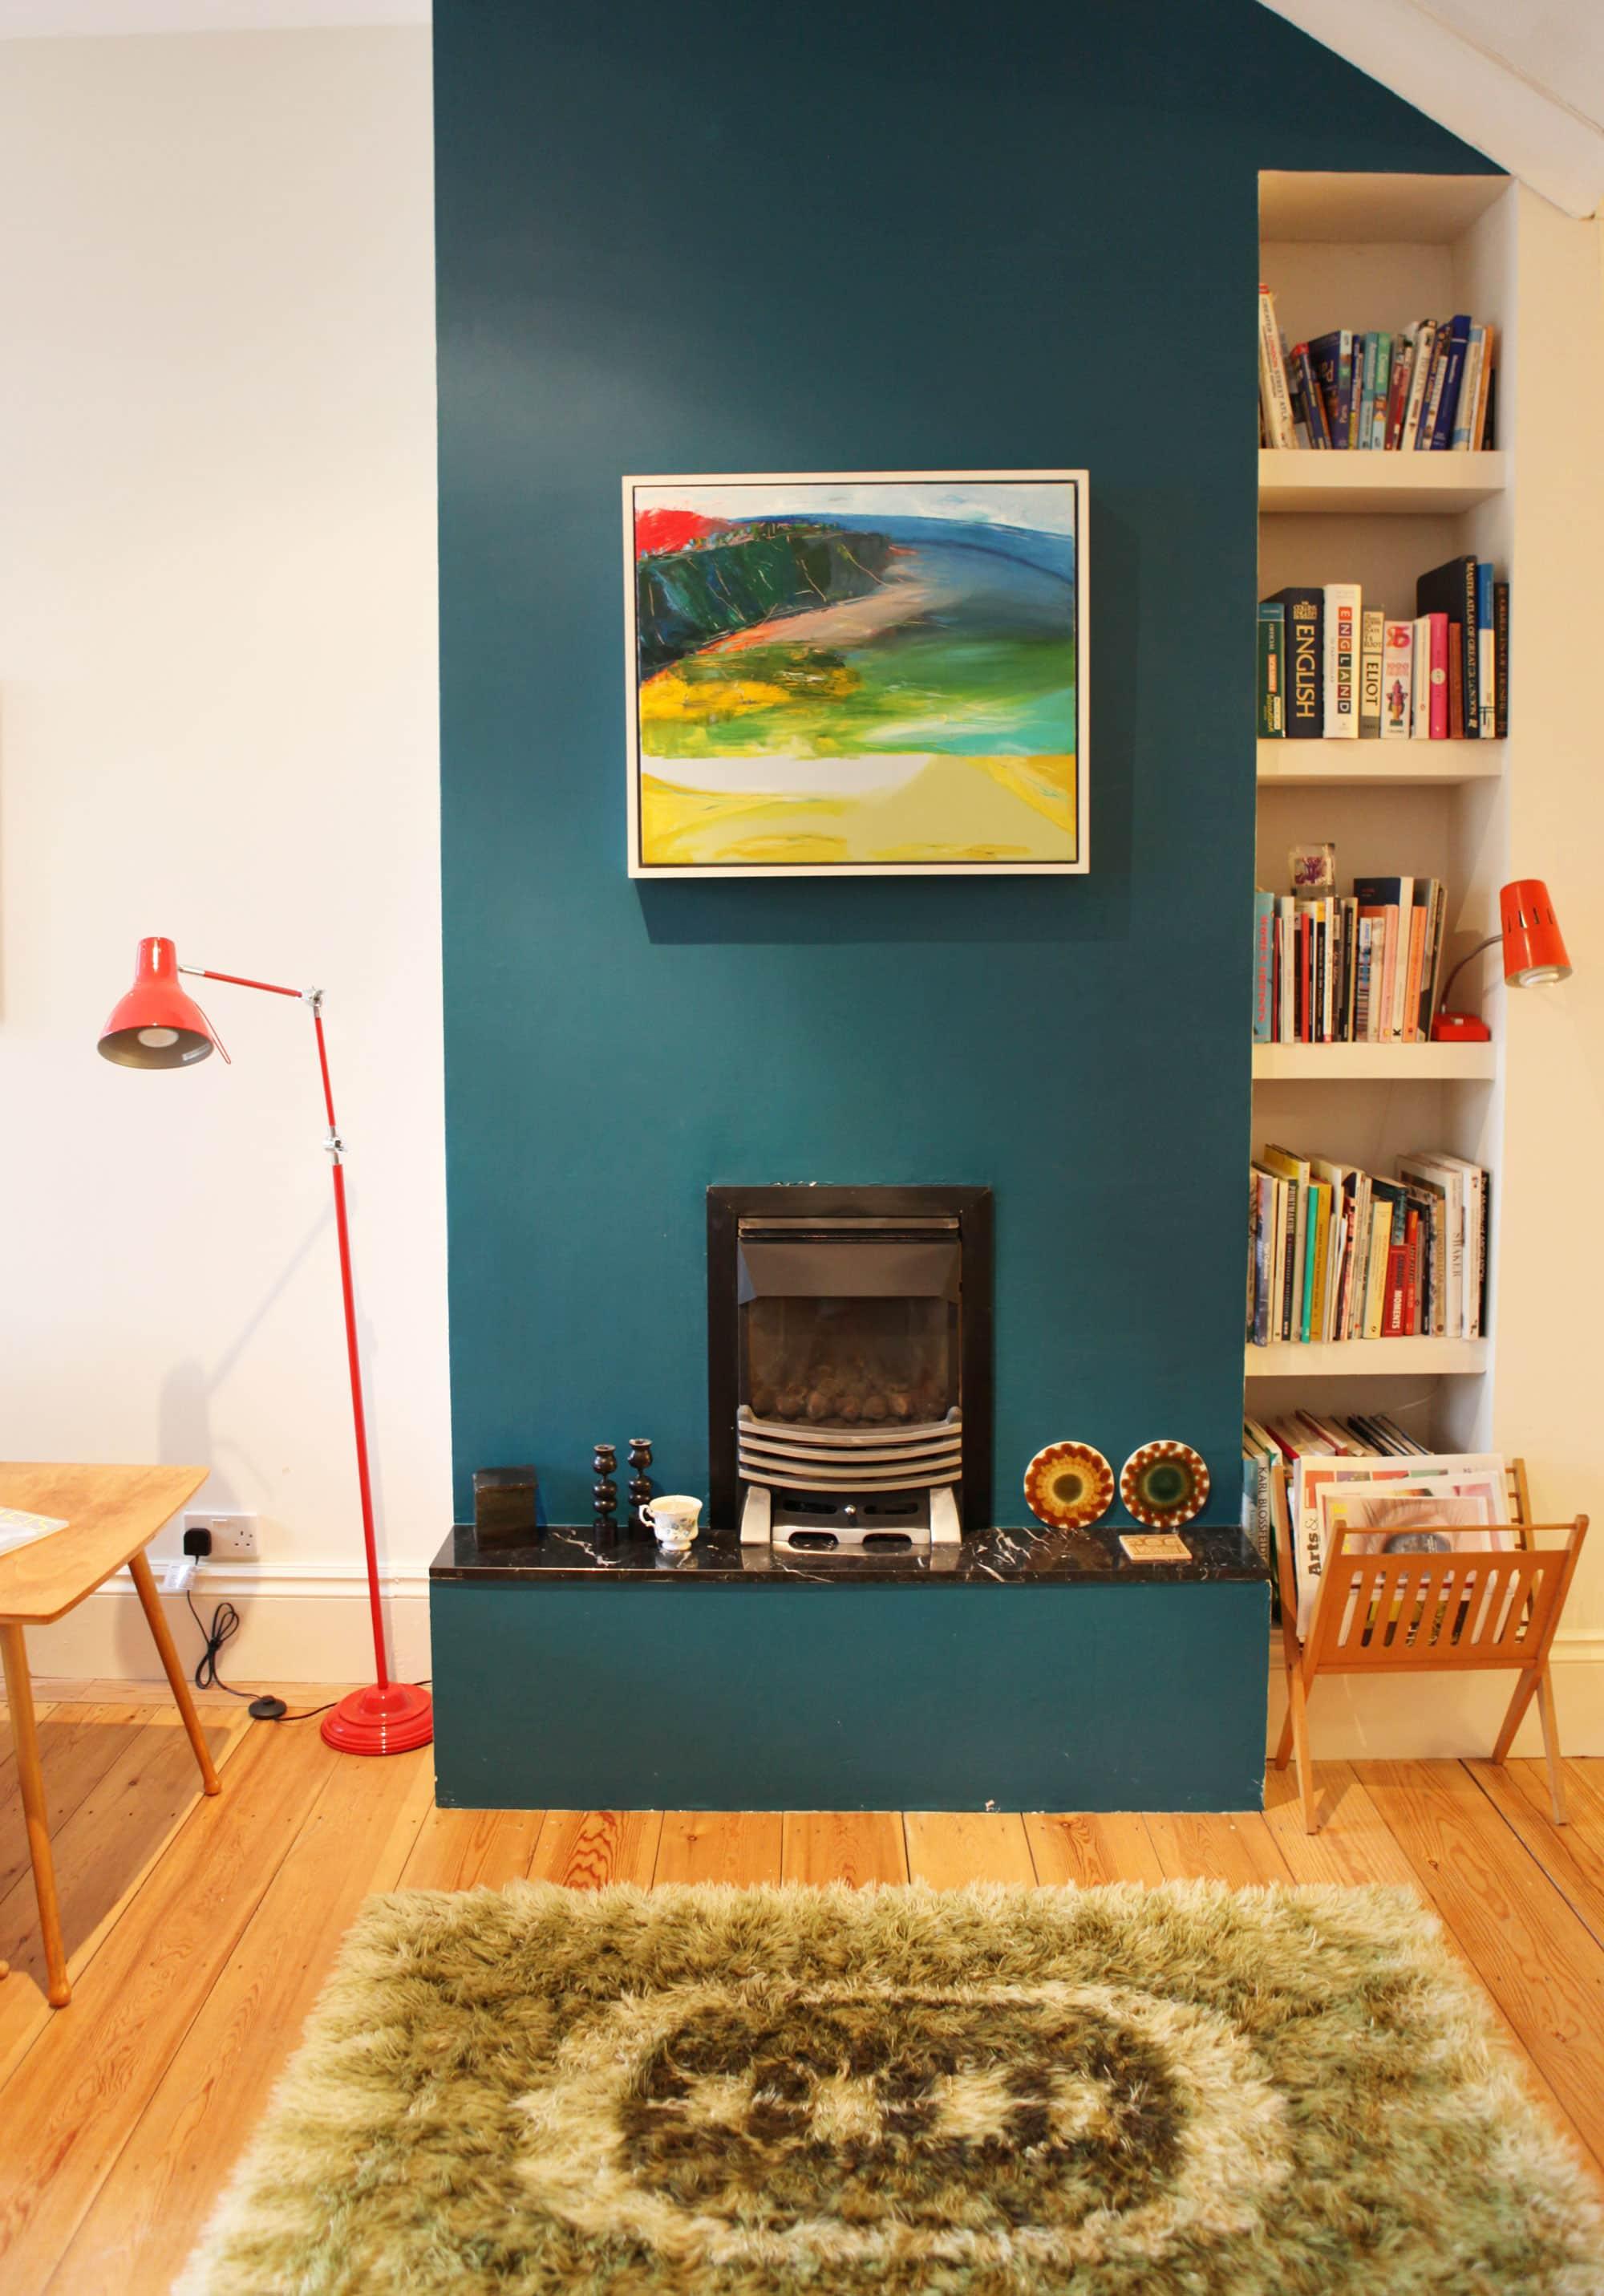 Lesley's Cozy Cool UK Coastal Home: gallery image 11